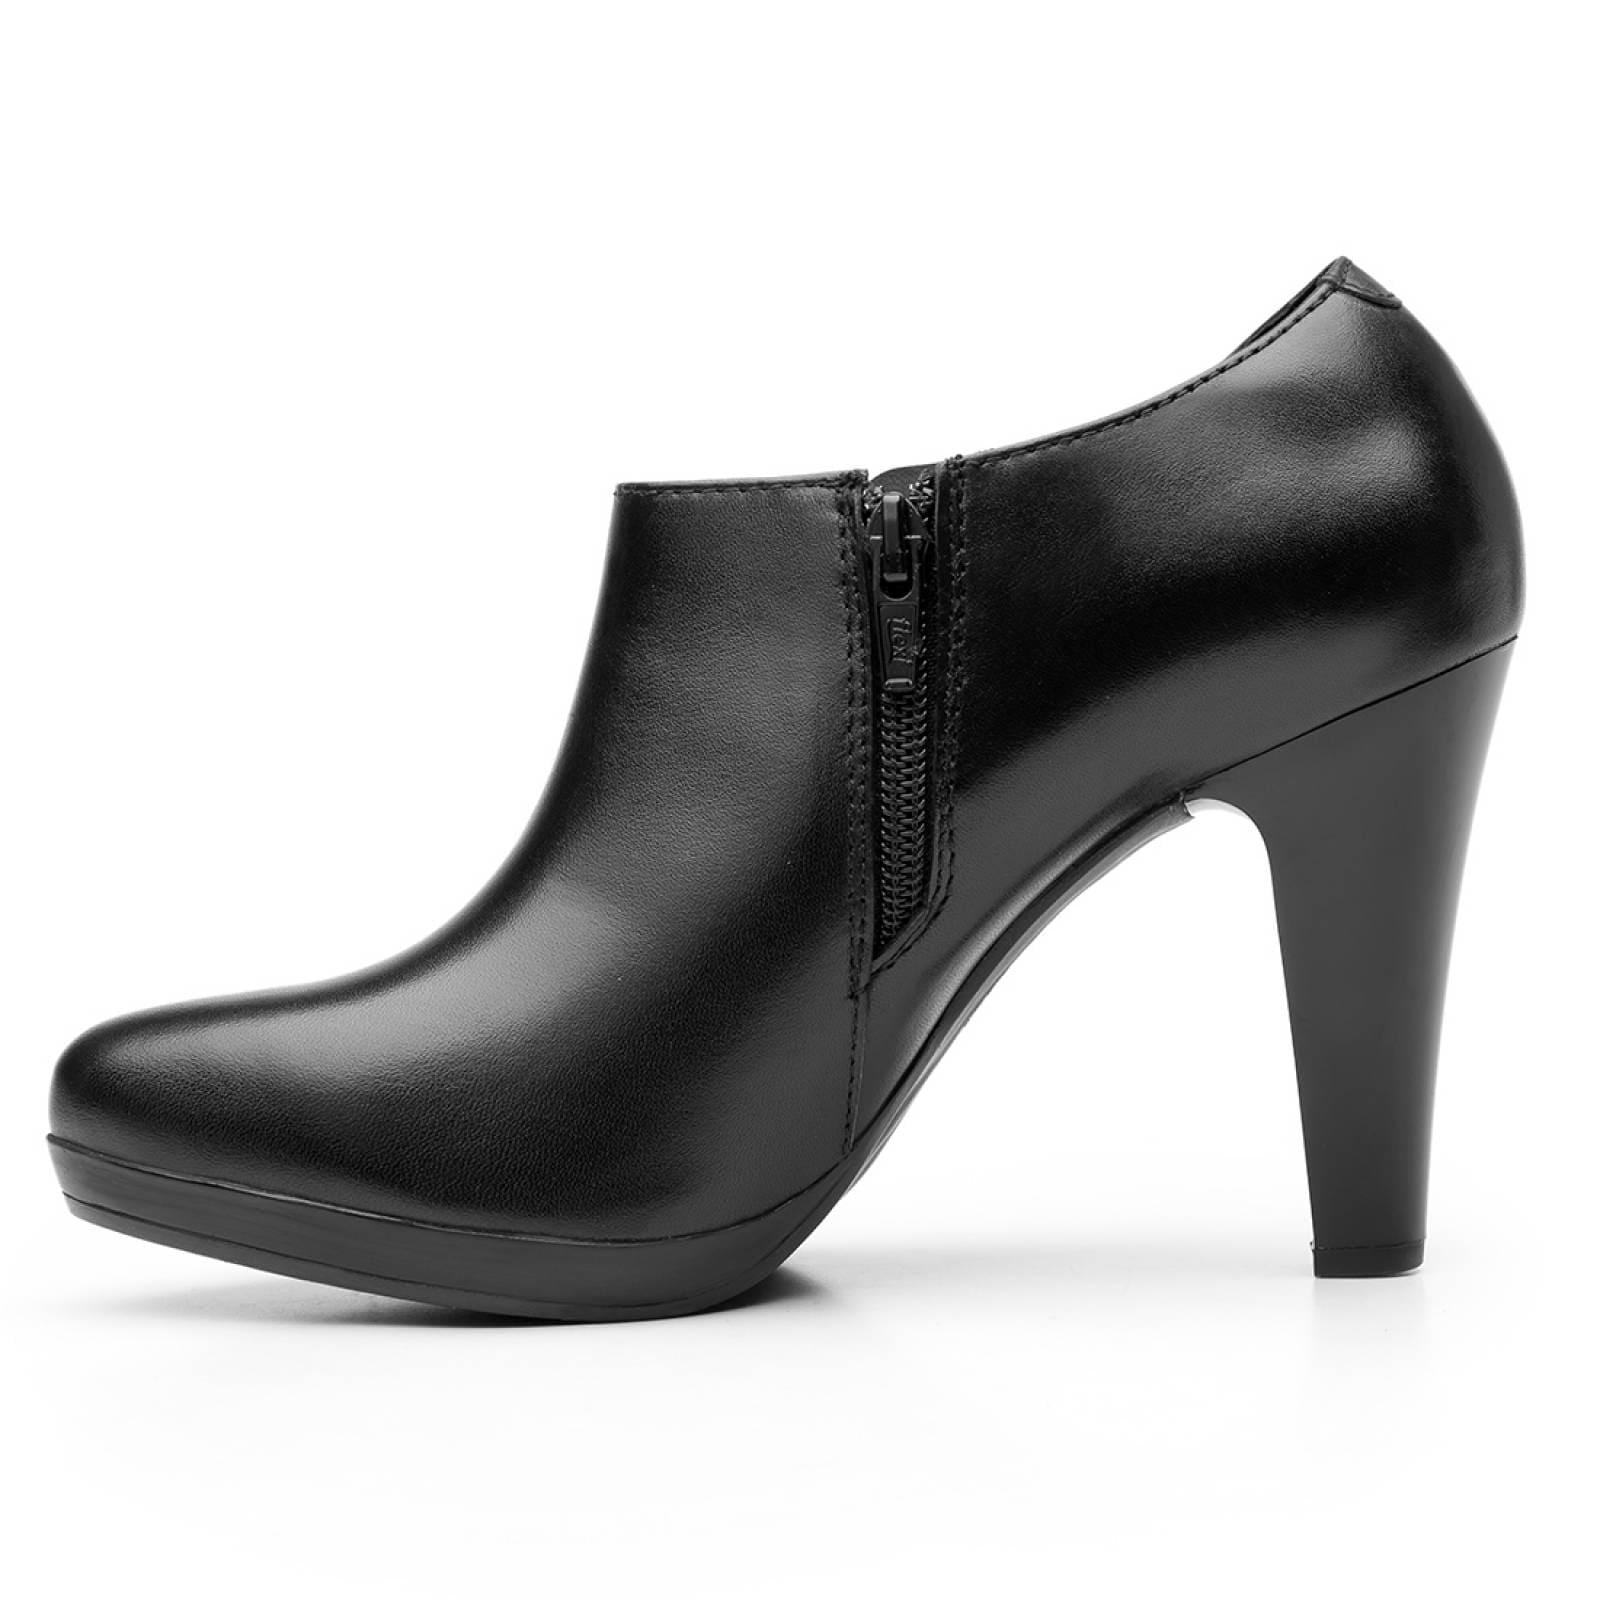 Zapatilla Flexi para mujer - 33617  negro